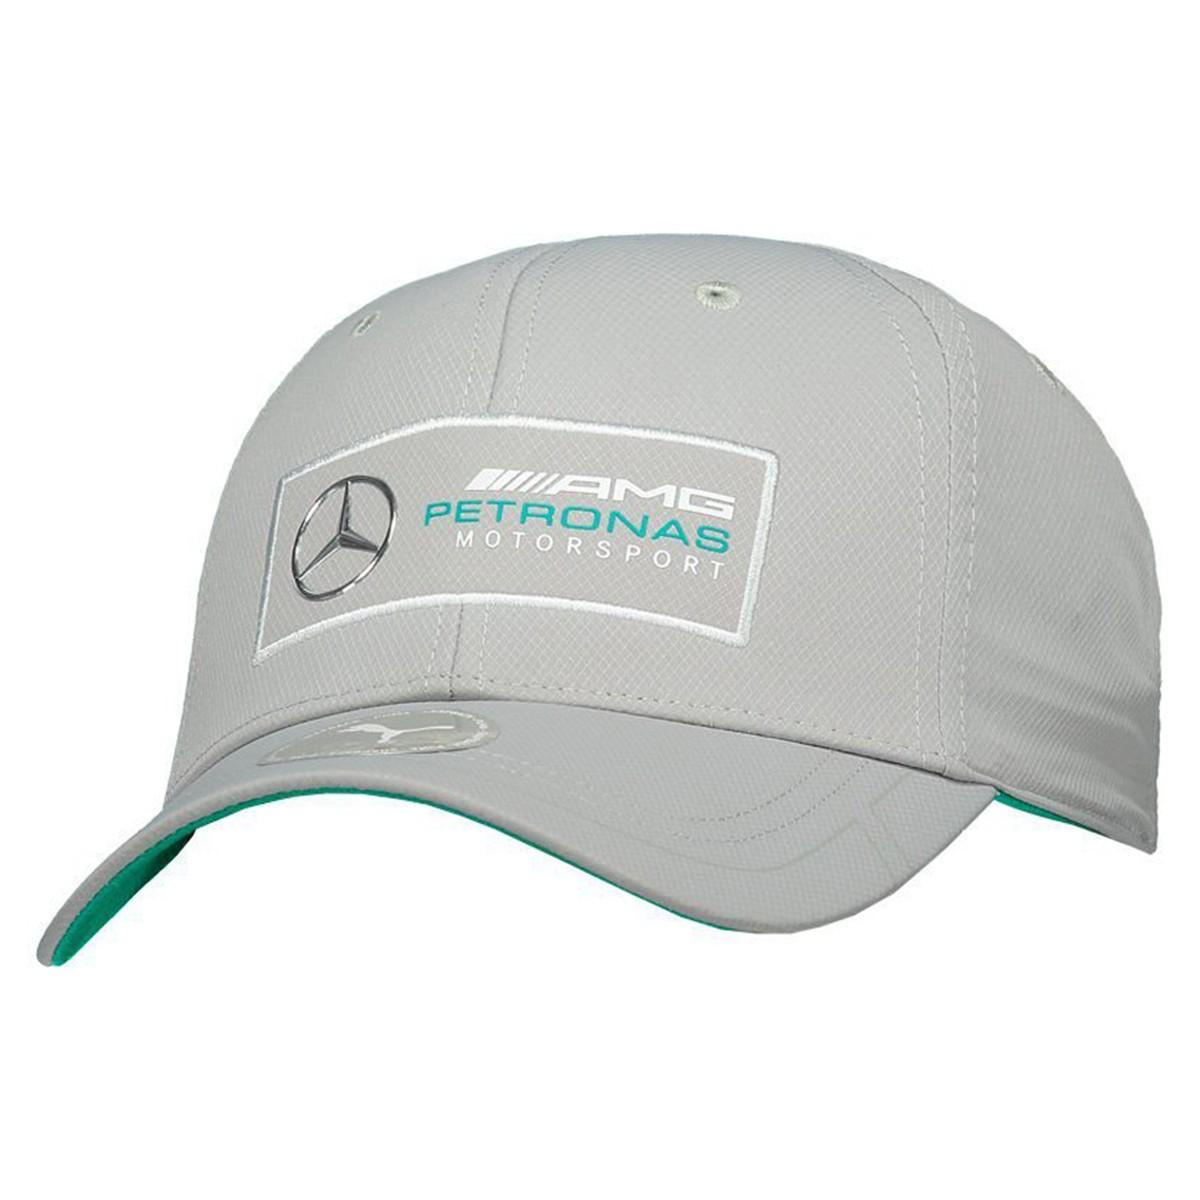 Boné Mercedes Puma AMG Petronas Motorsport  - Prata - Masculino